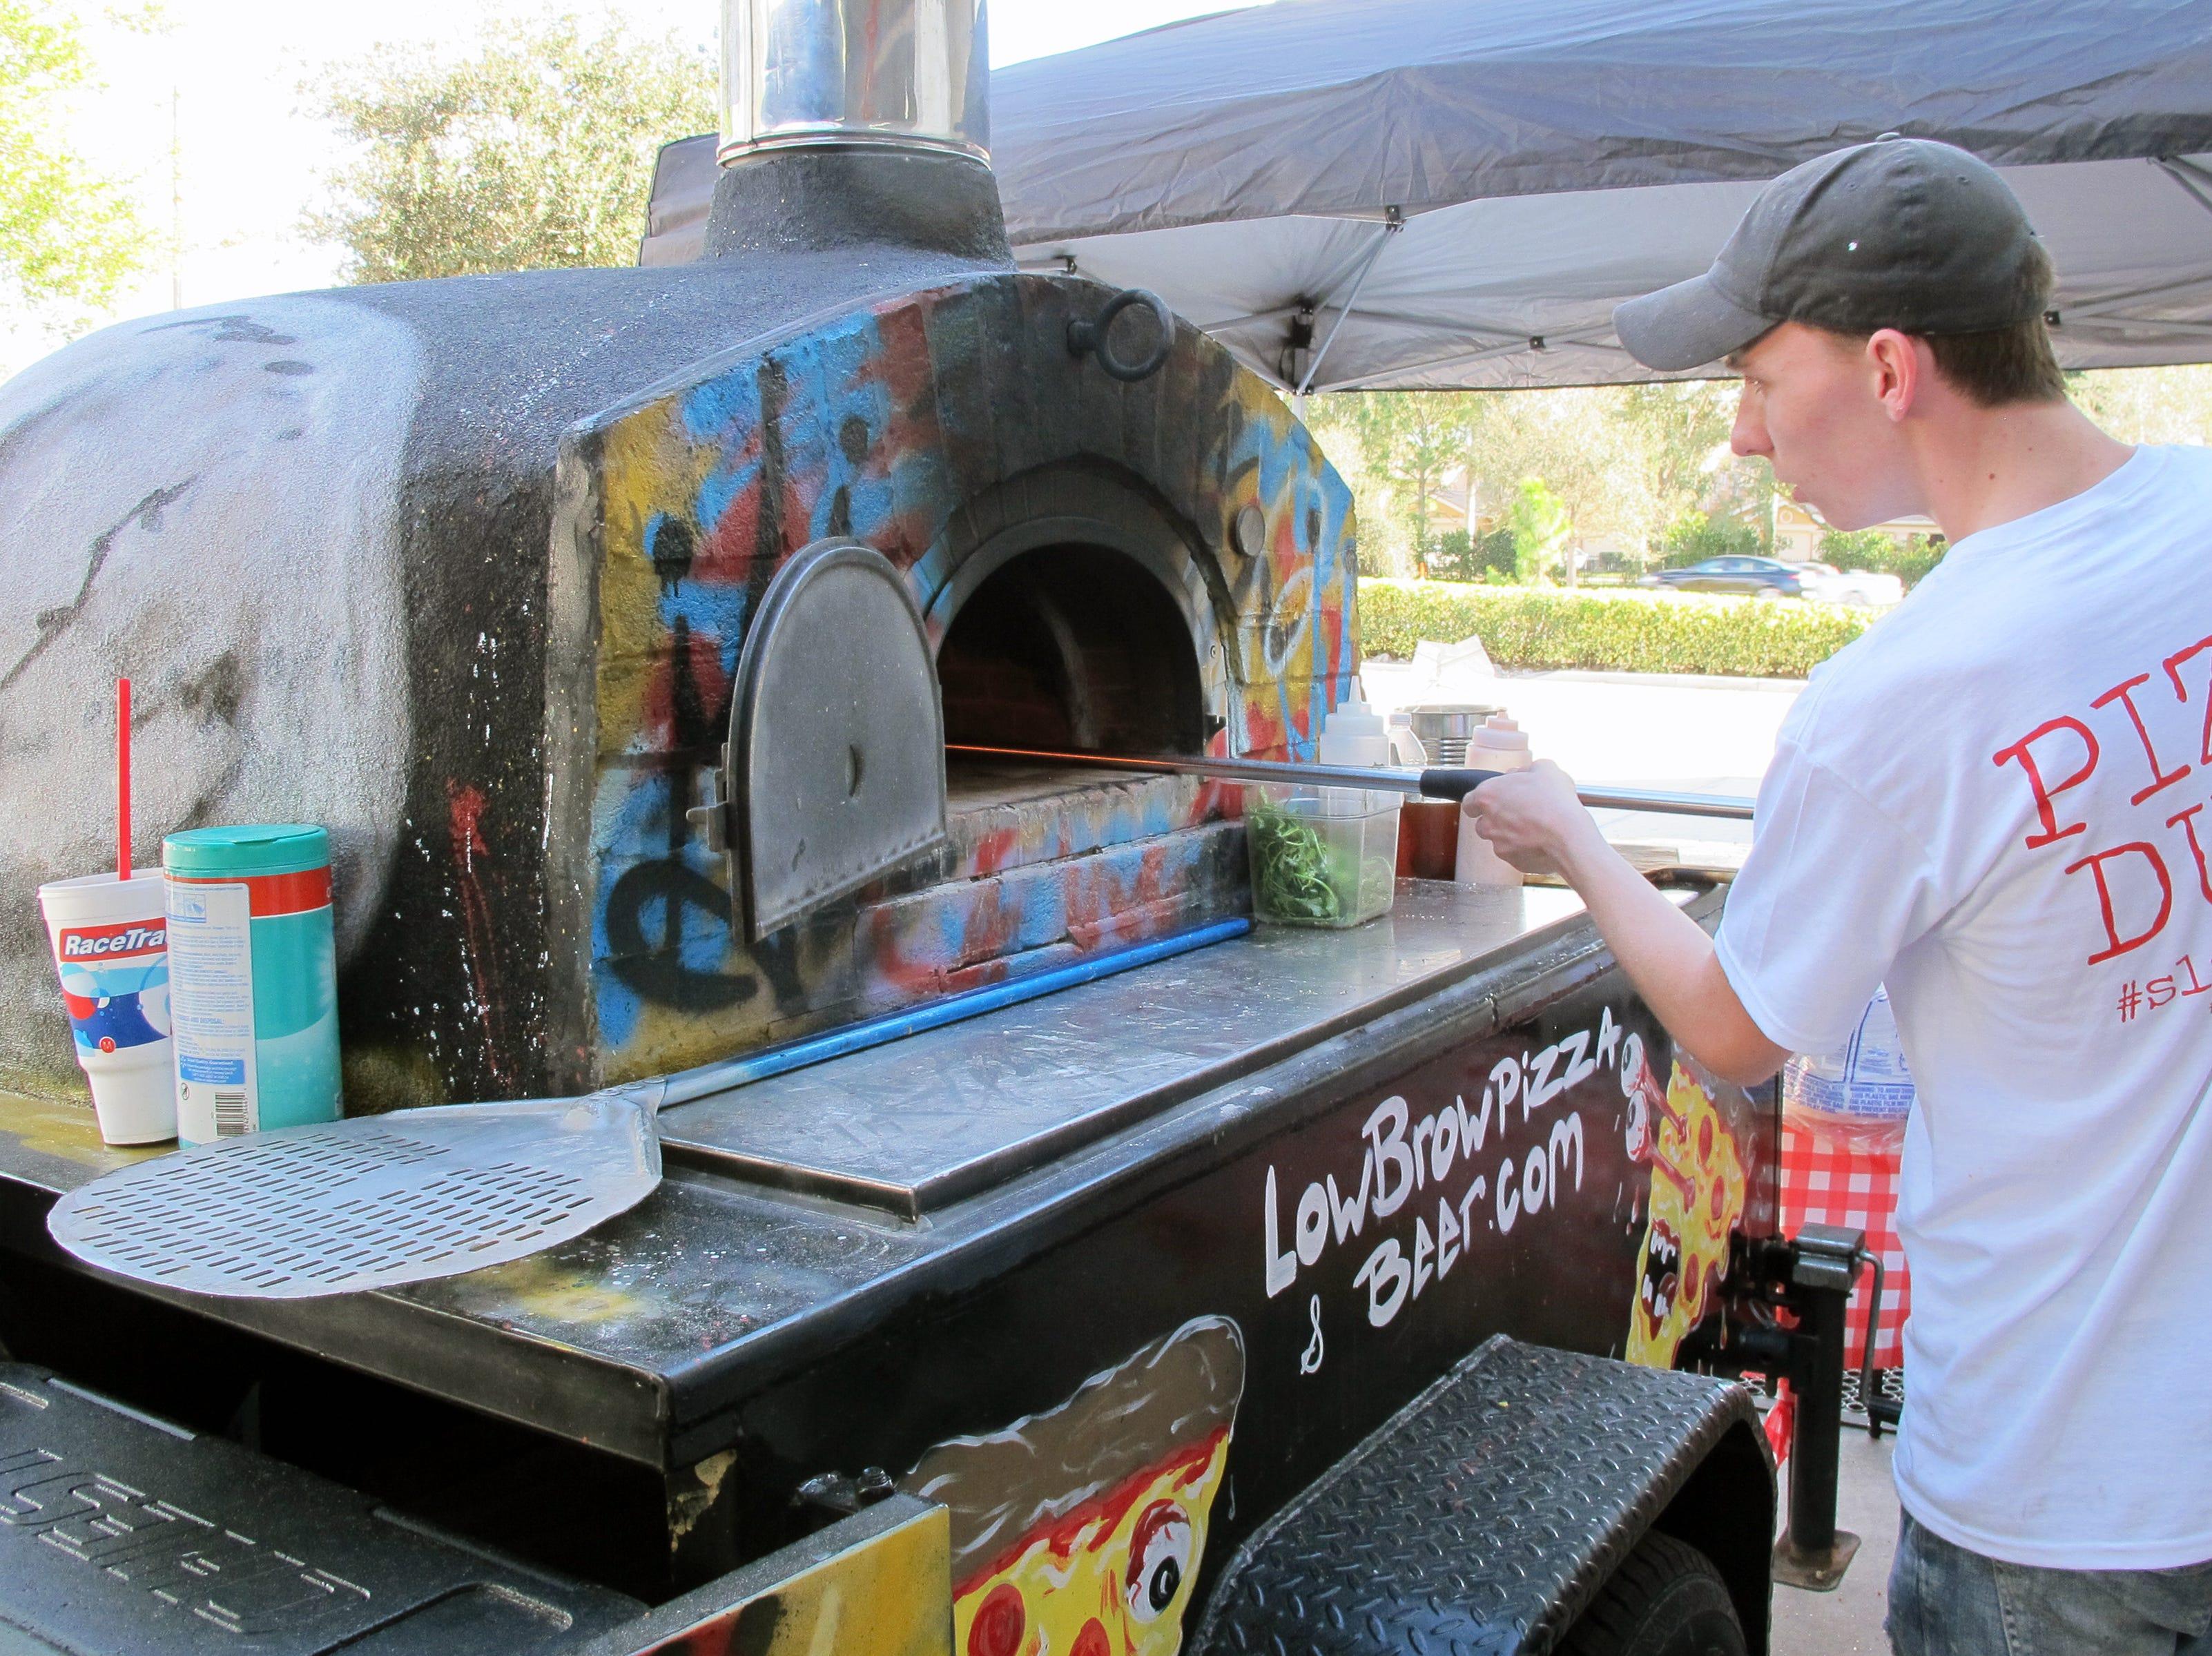 LowBrow Pizza was the food vendor Sunday, Feb. 10, 2019, at Momentum Brewhouse on Bonita Beach Road in Bonita Springs.